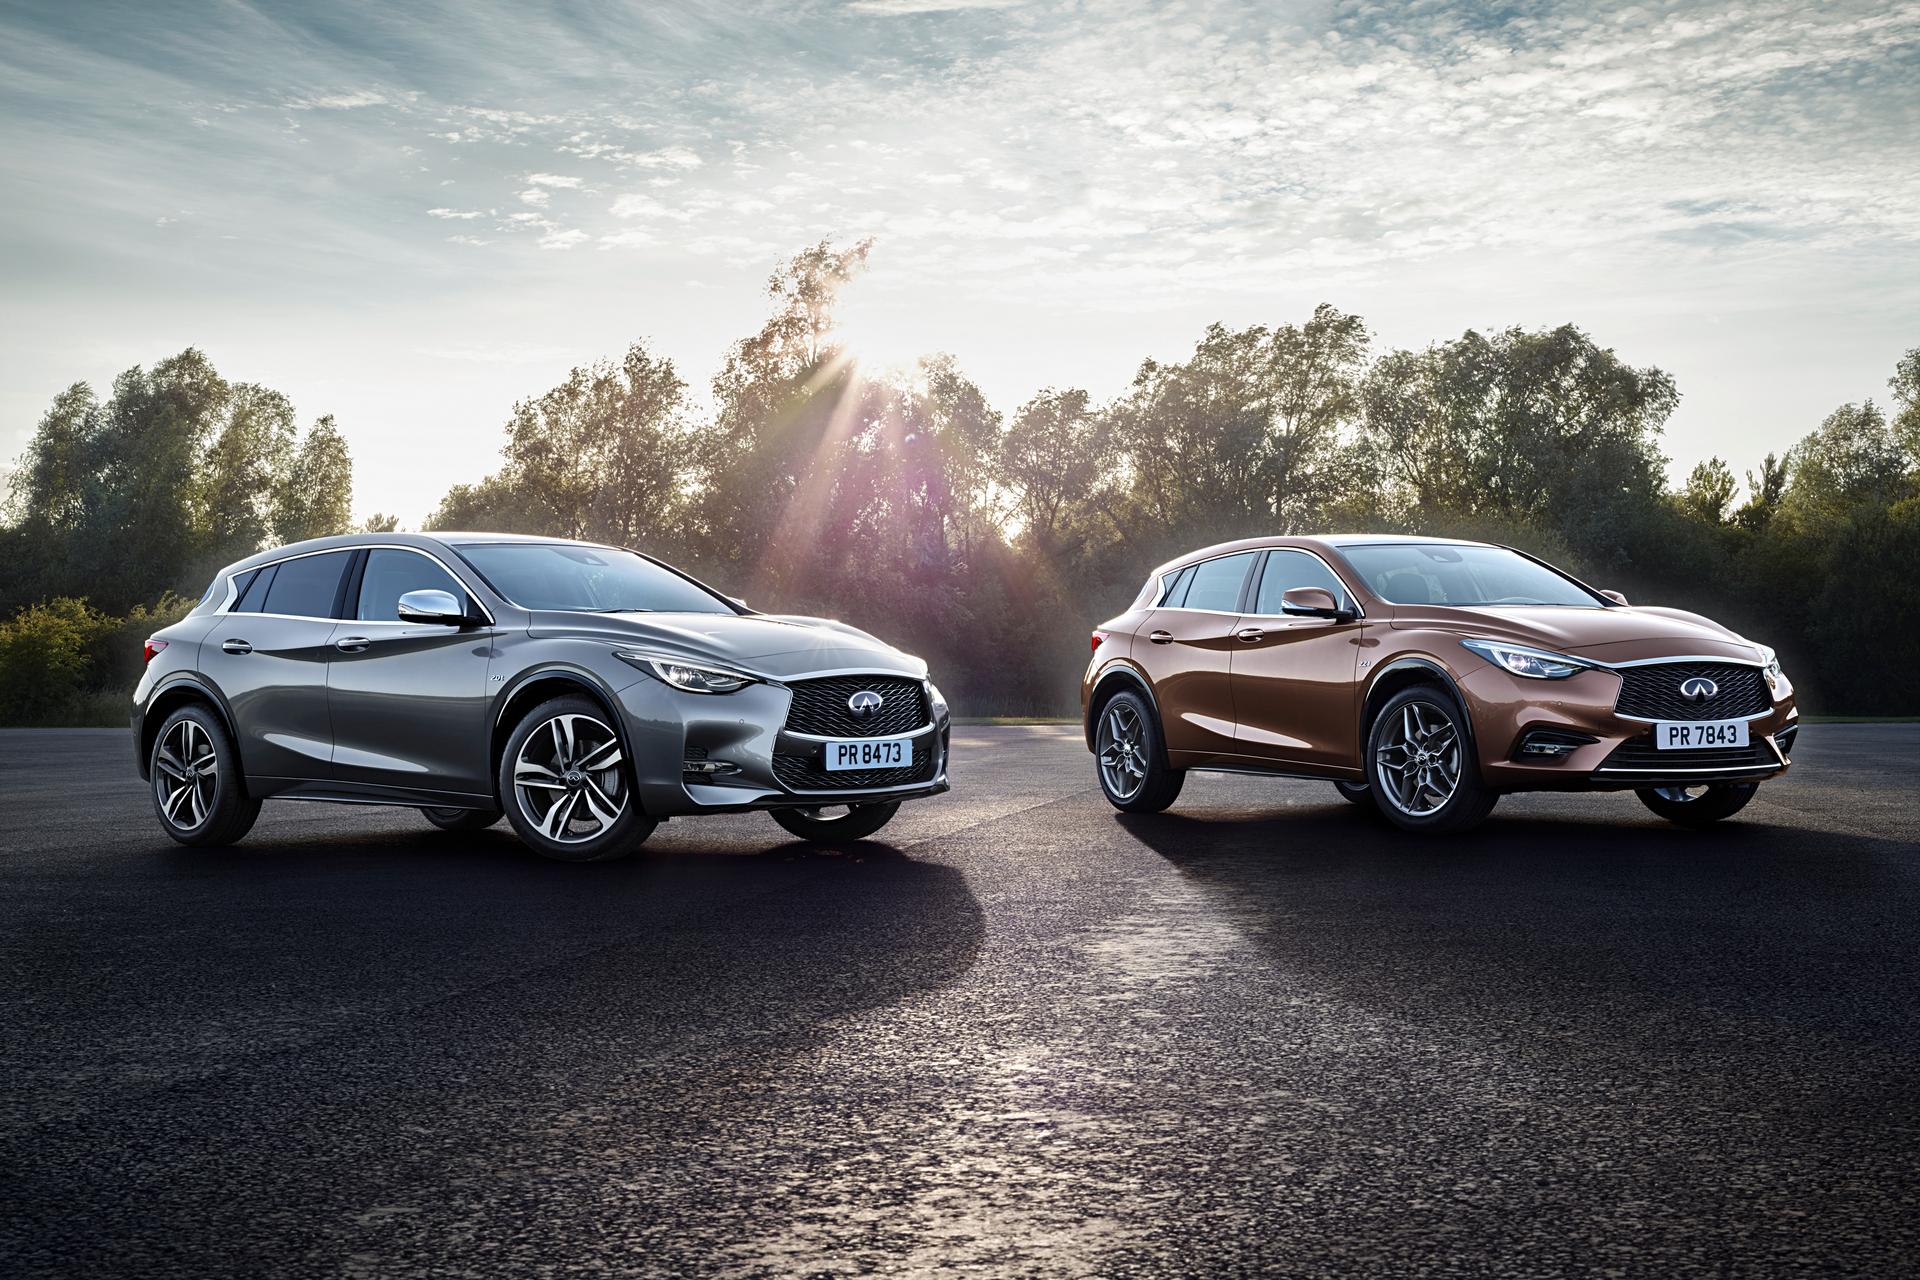 2017 Infiniti QX30 and QX30S © Nissan Motor Co., Ltd.